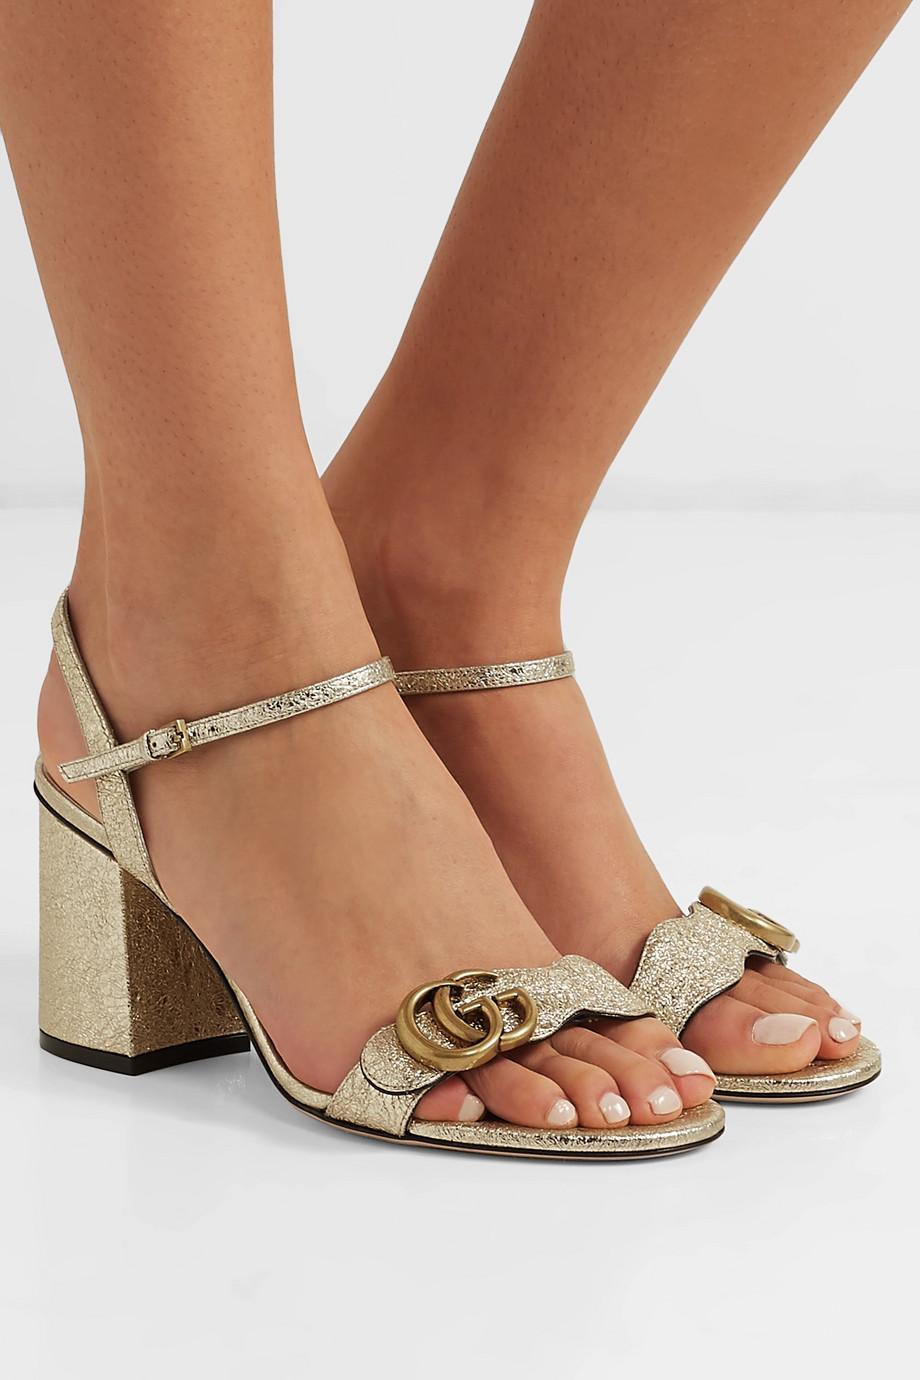 Gucci Marmont logo-embellished metallic cracked-leather sandals